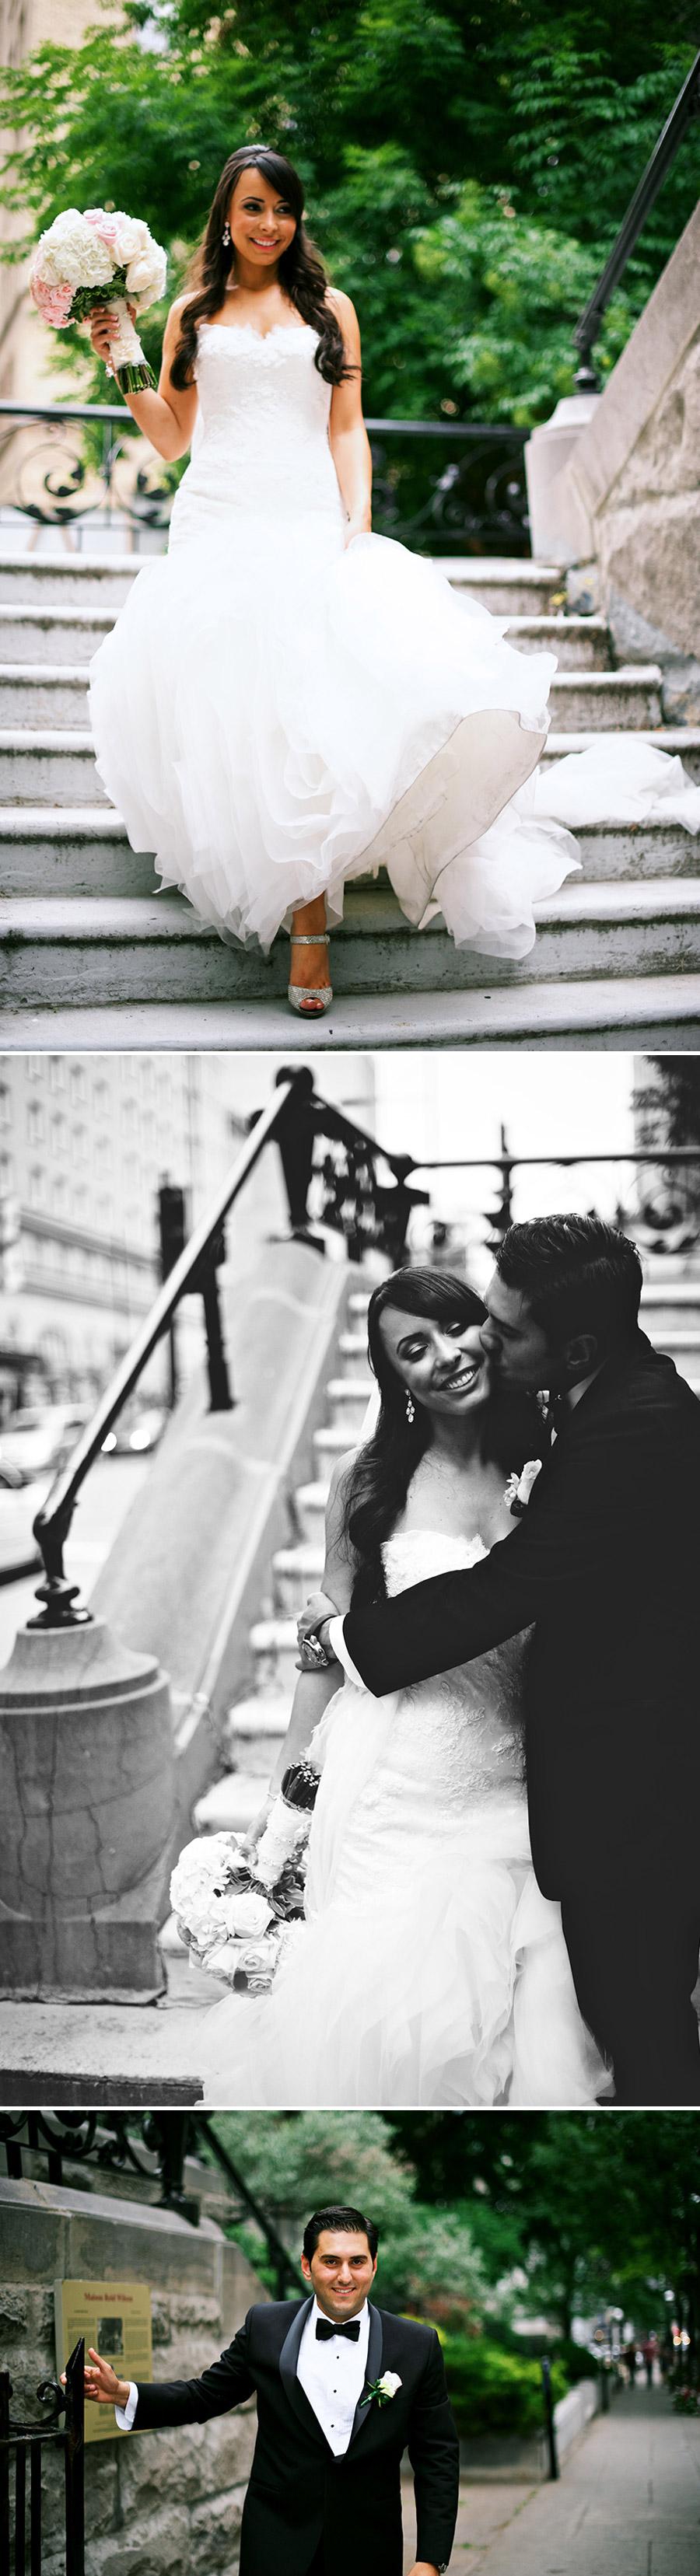 Blog-Collage-1409609344811.jpg